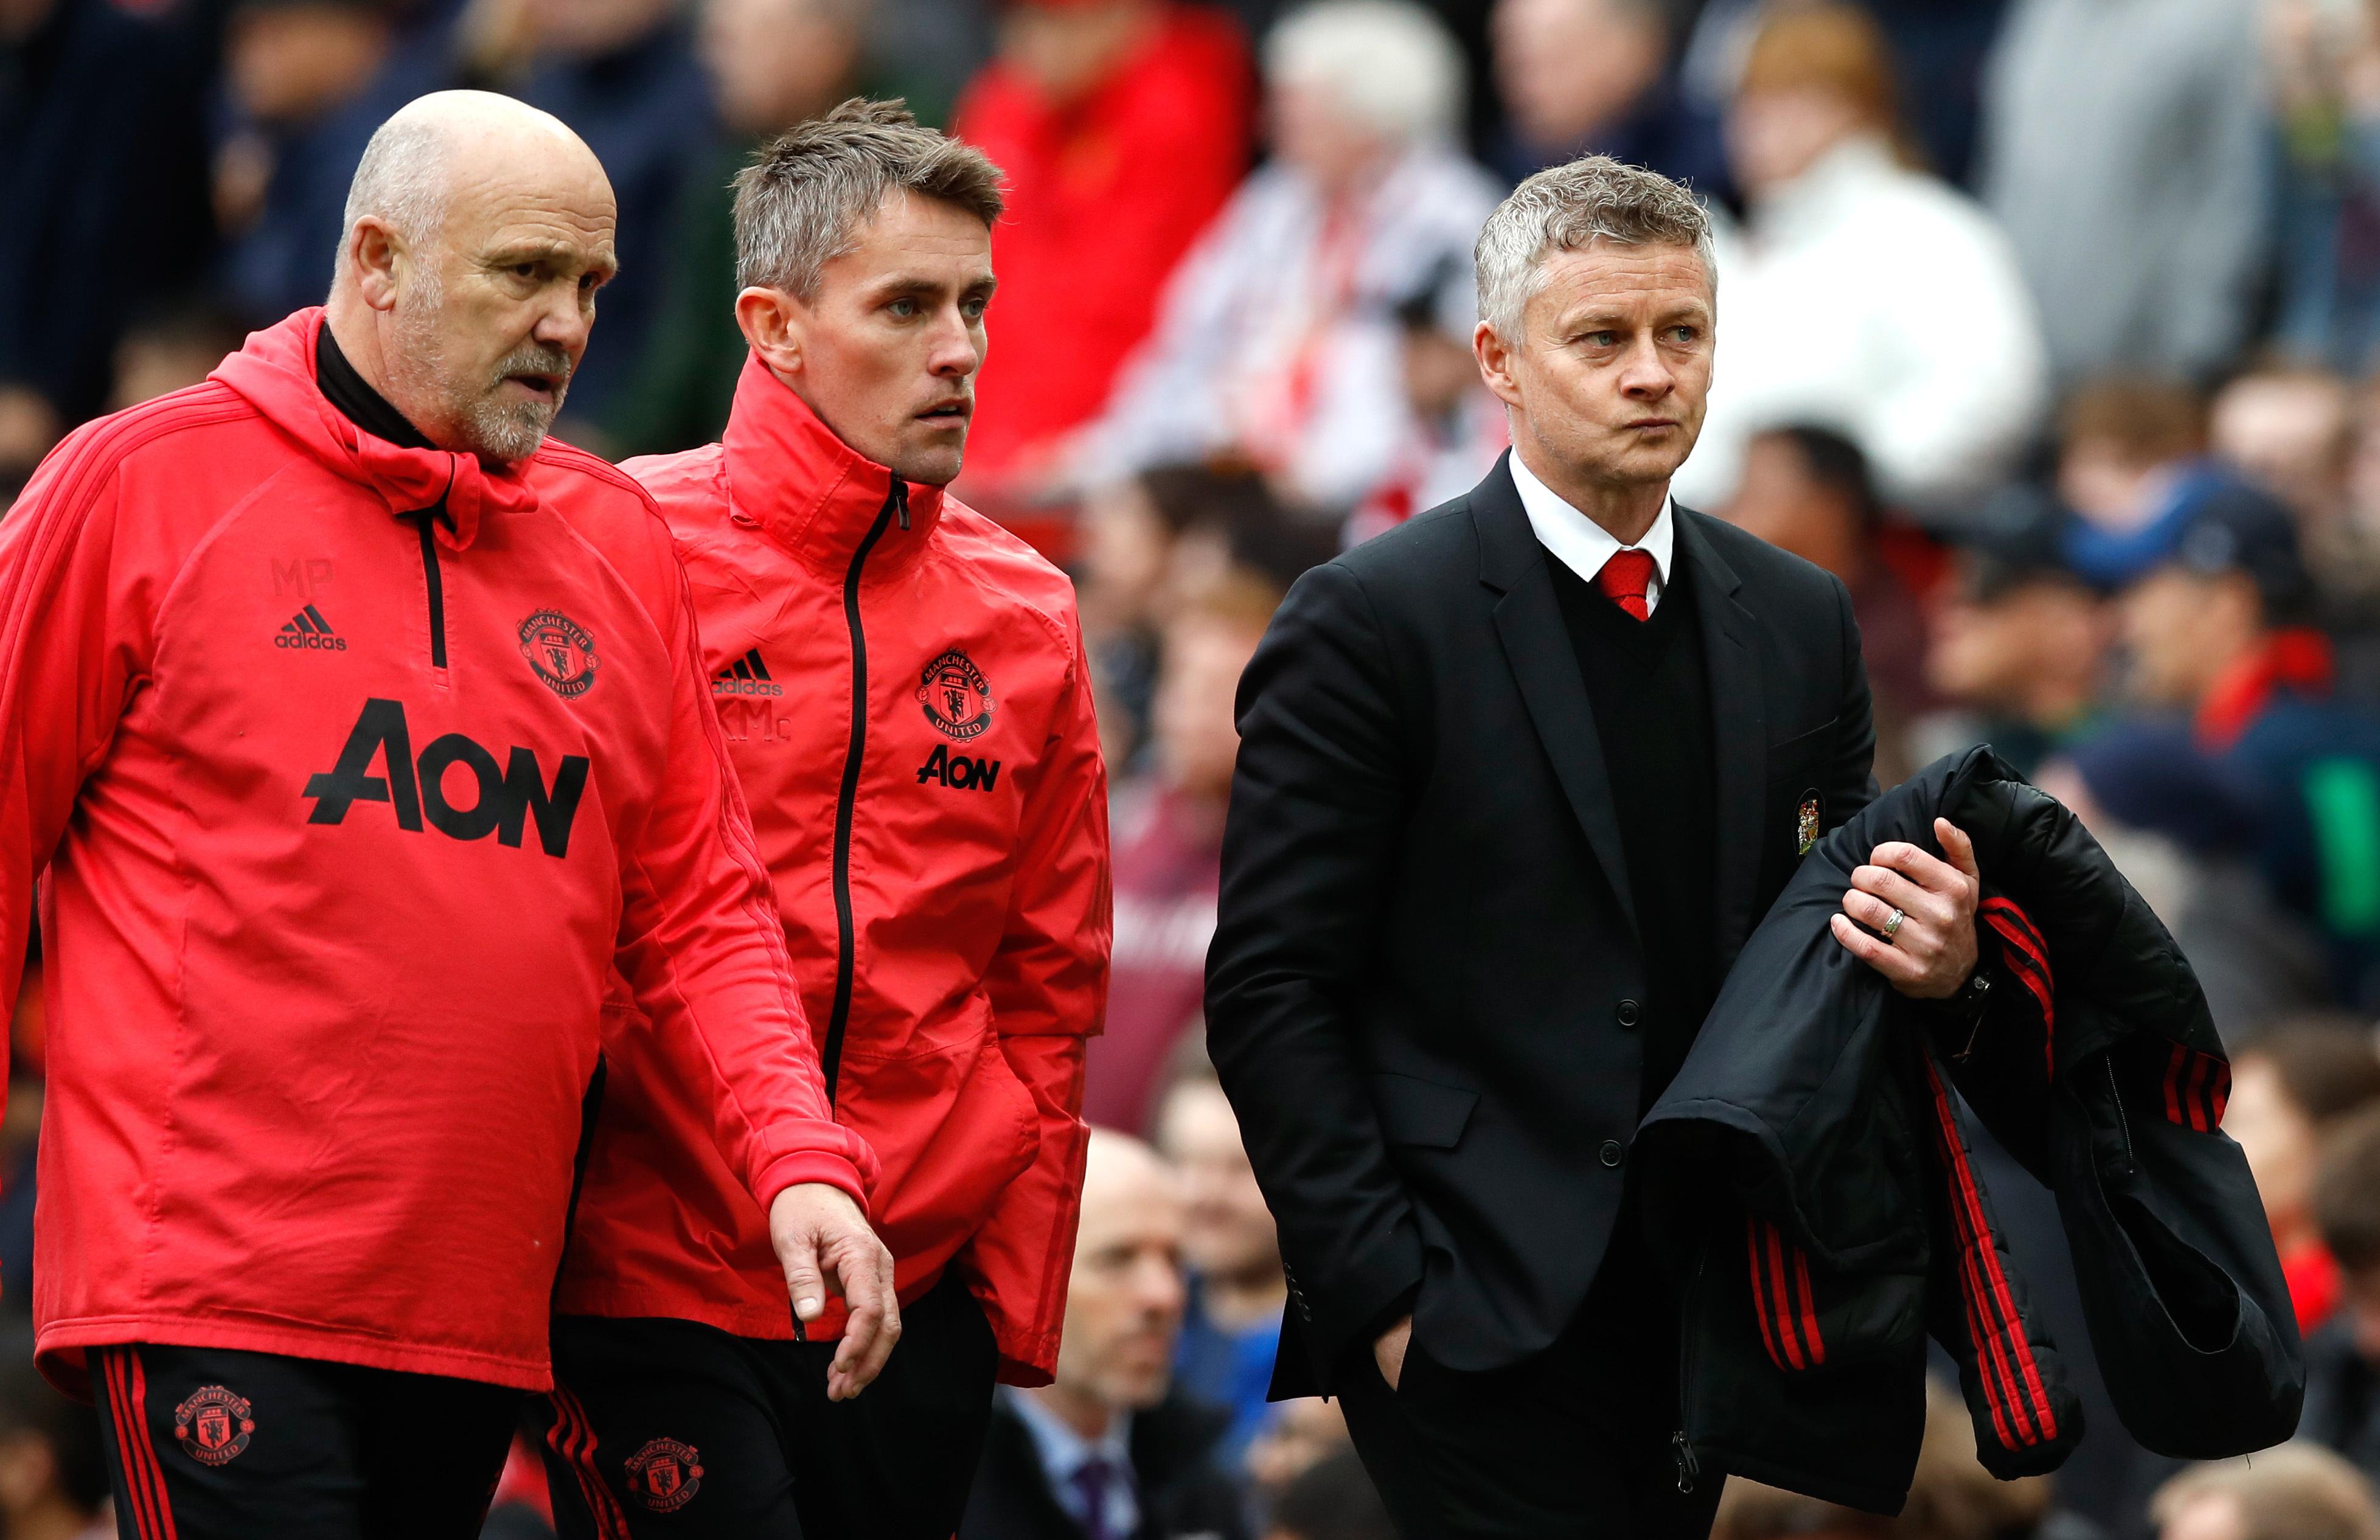 EPL: What De Gea told Man United teammates after error against Chelsea